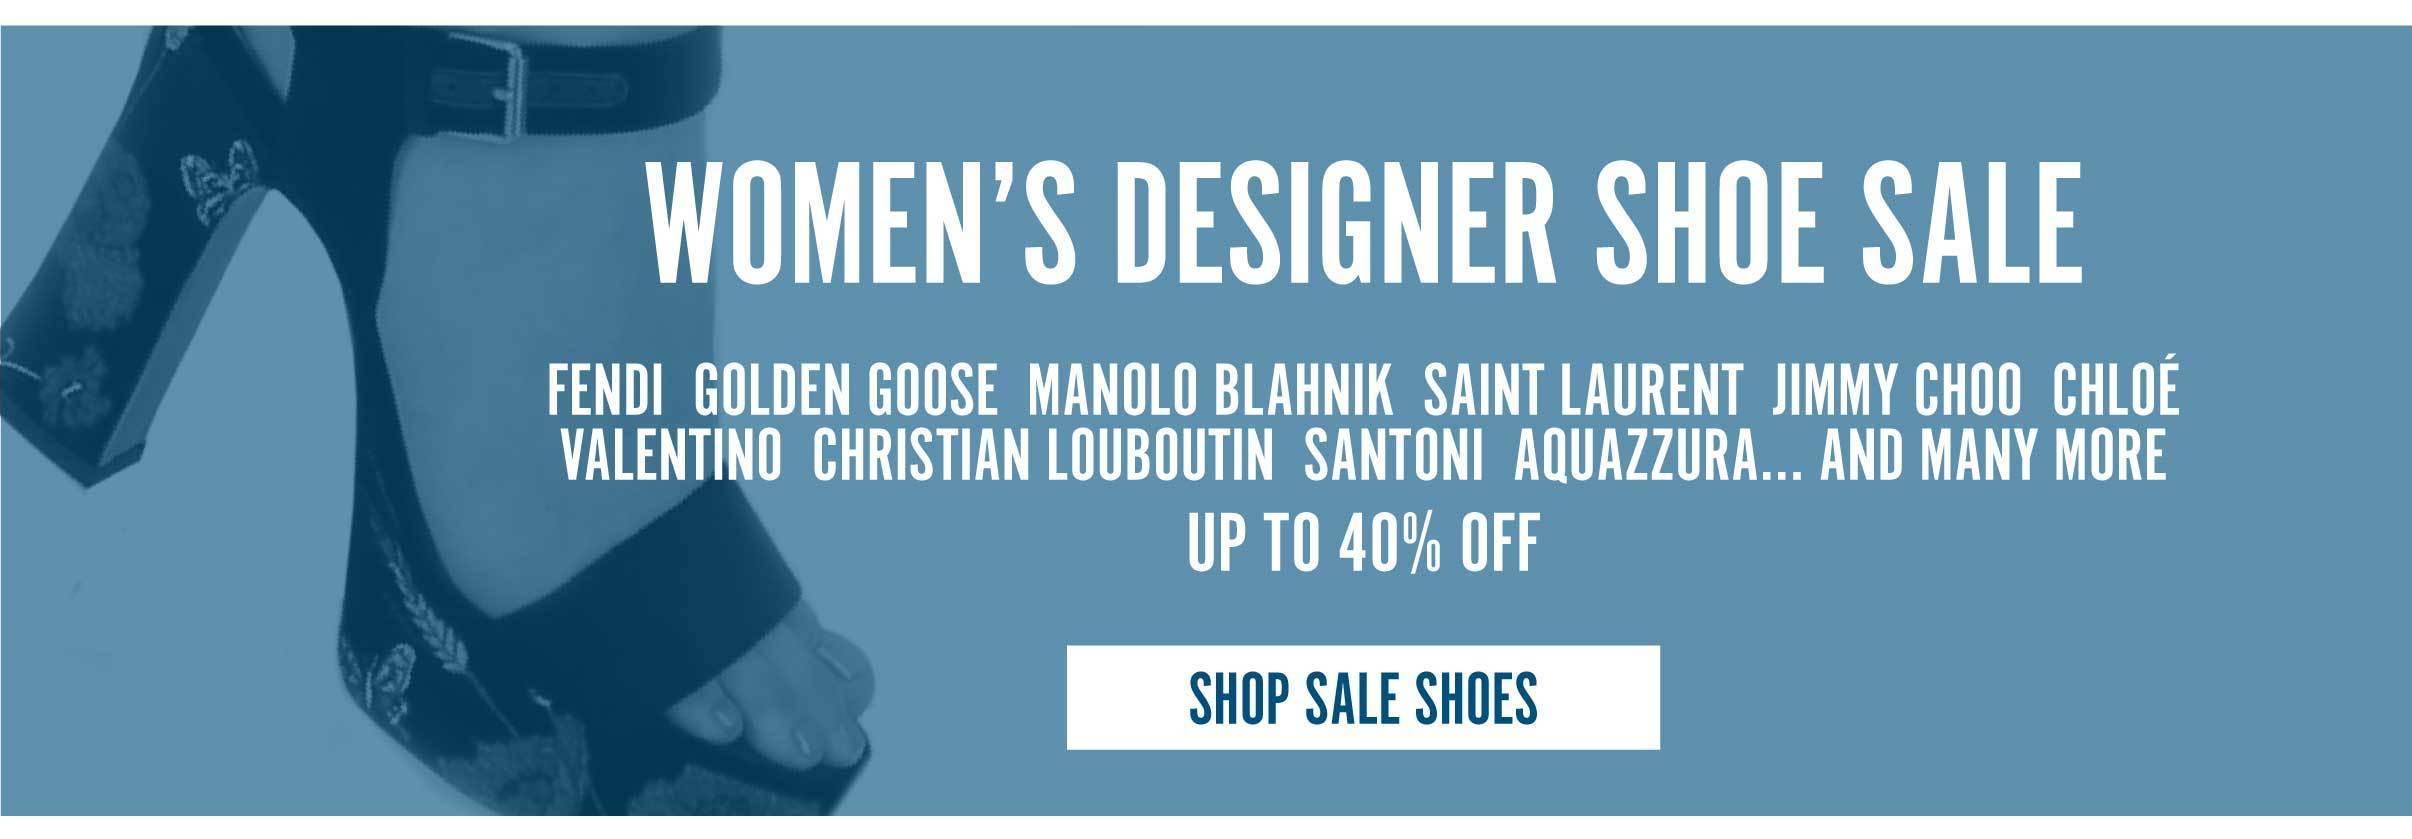 Women's Designer Shoe Sale